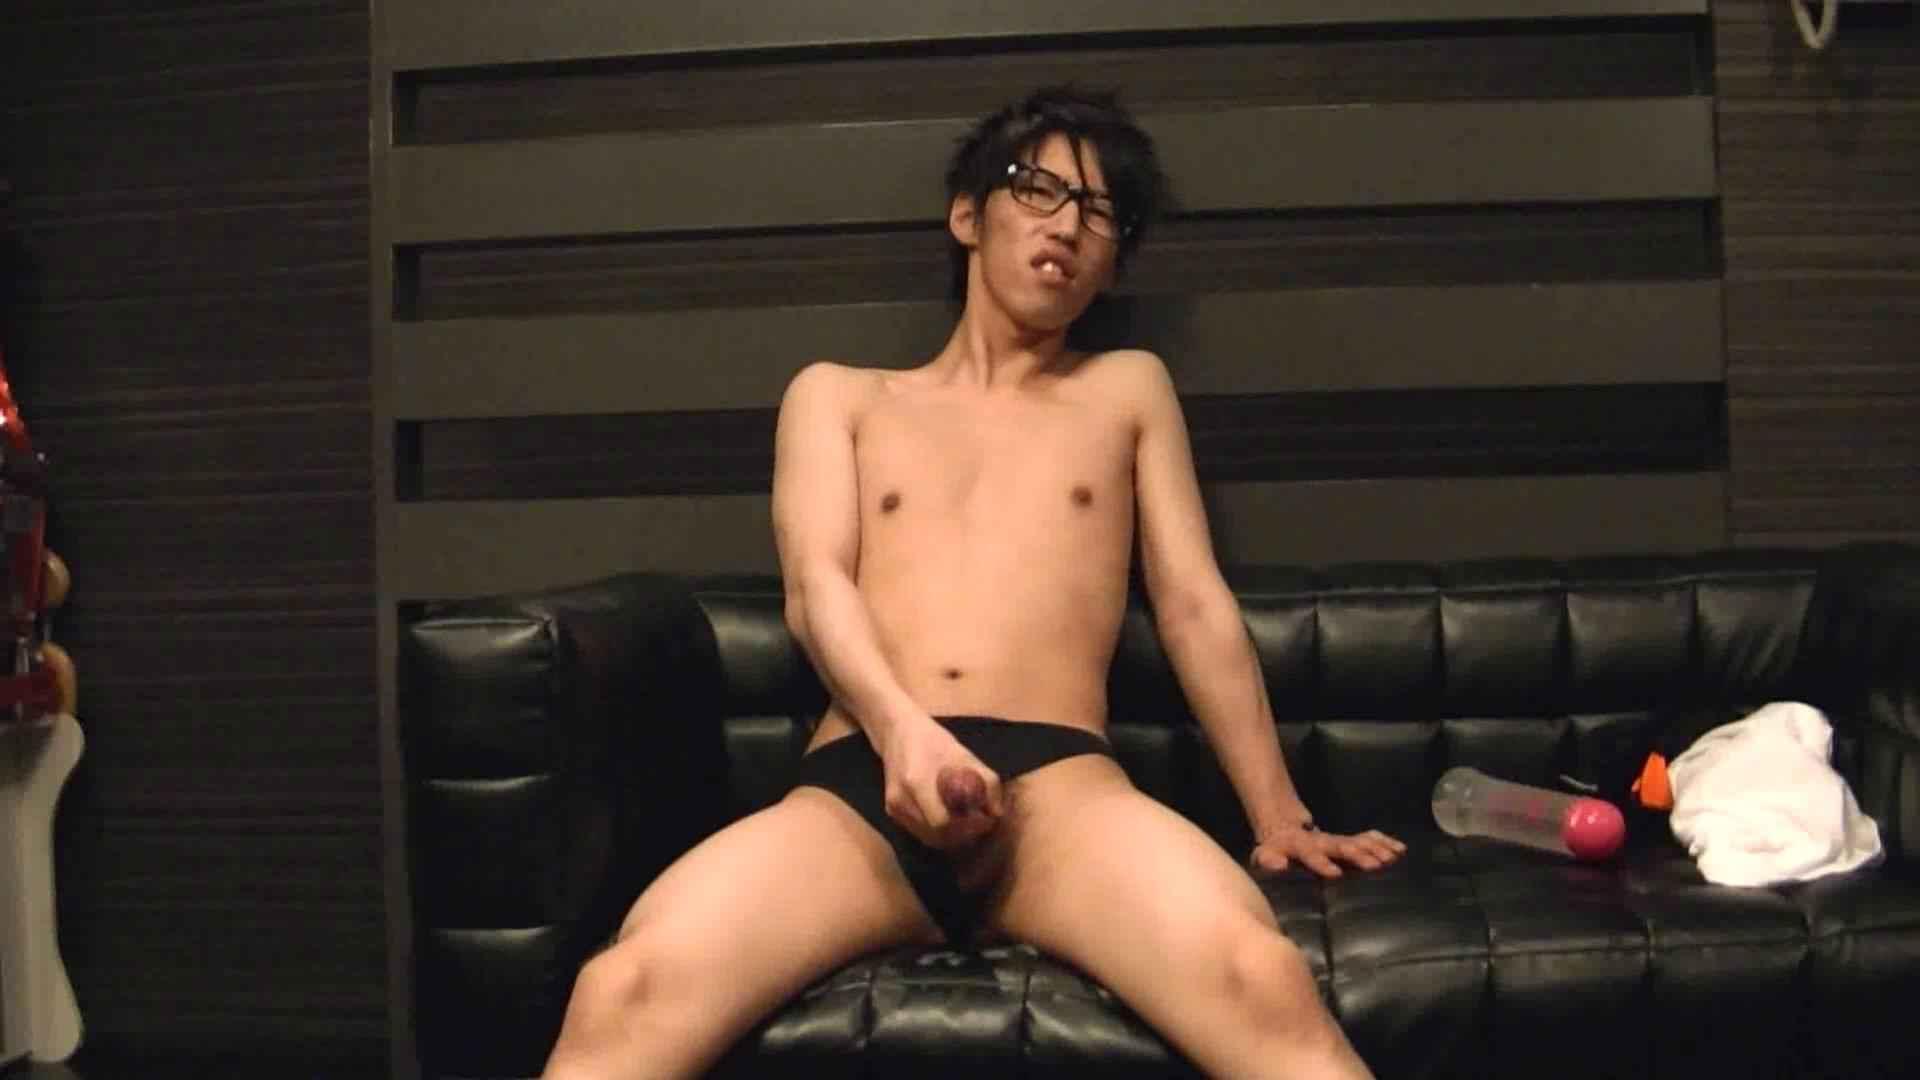 ONA見せカーニバル!! Vol3 男  93pic 14